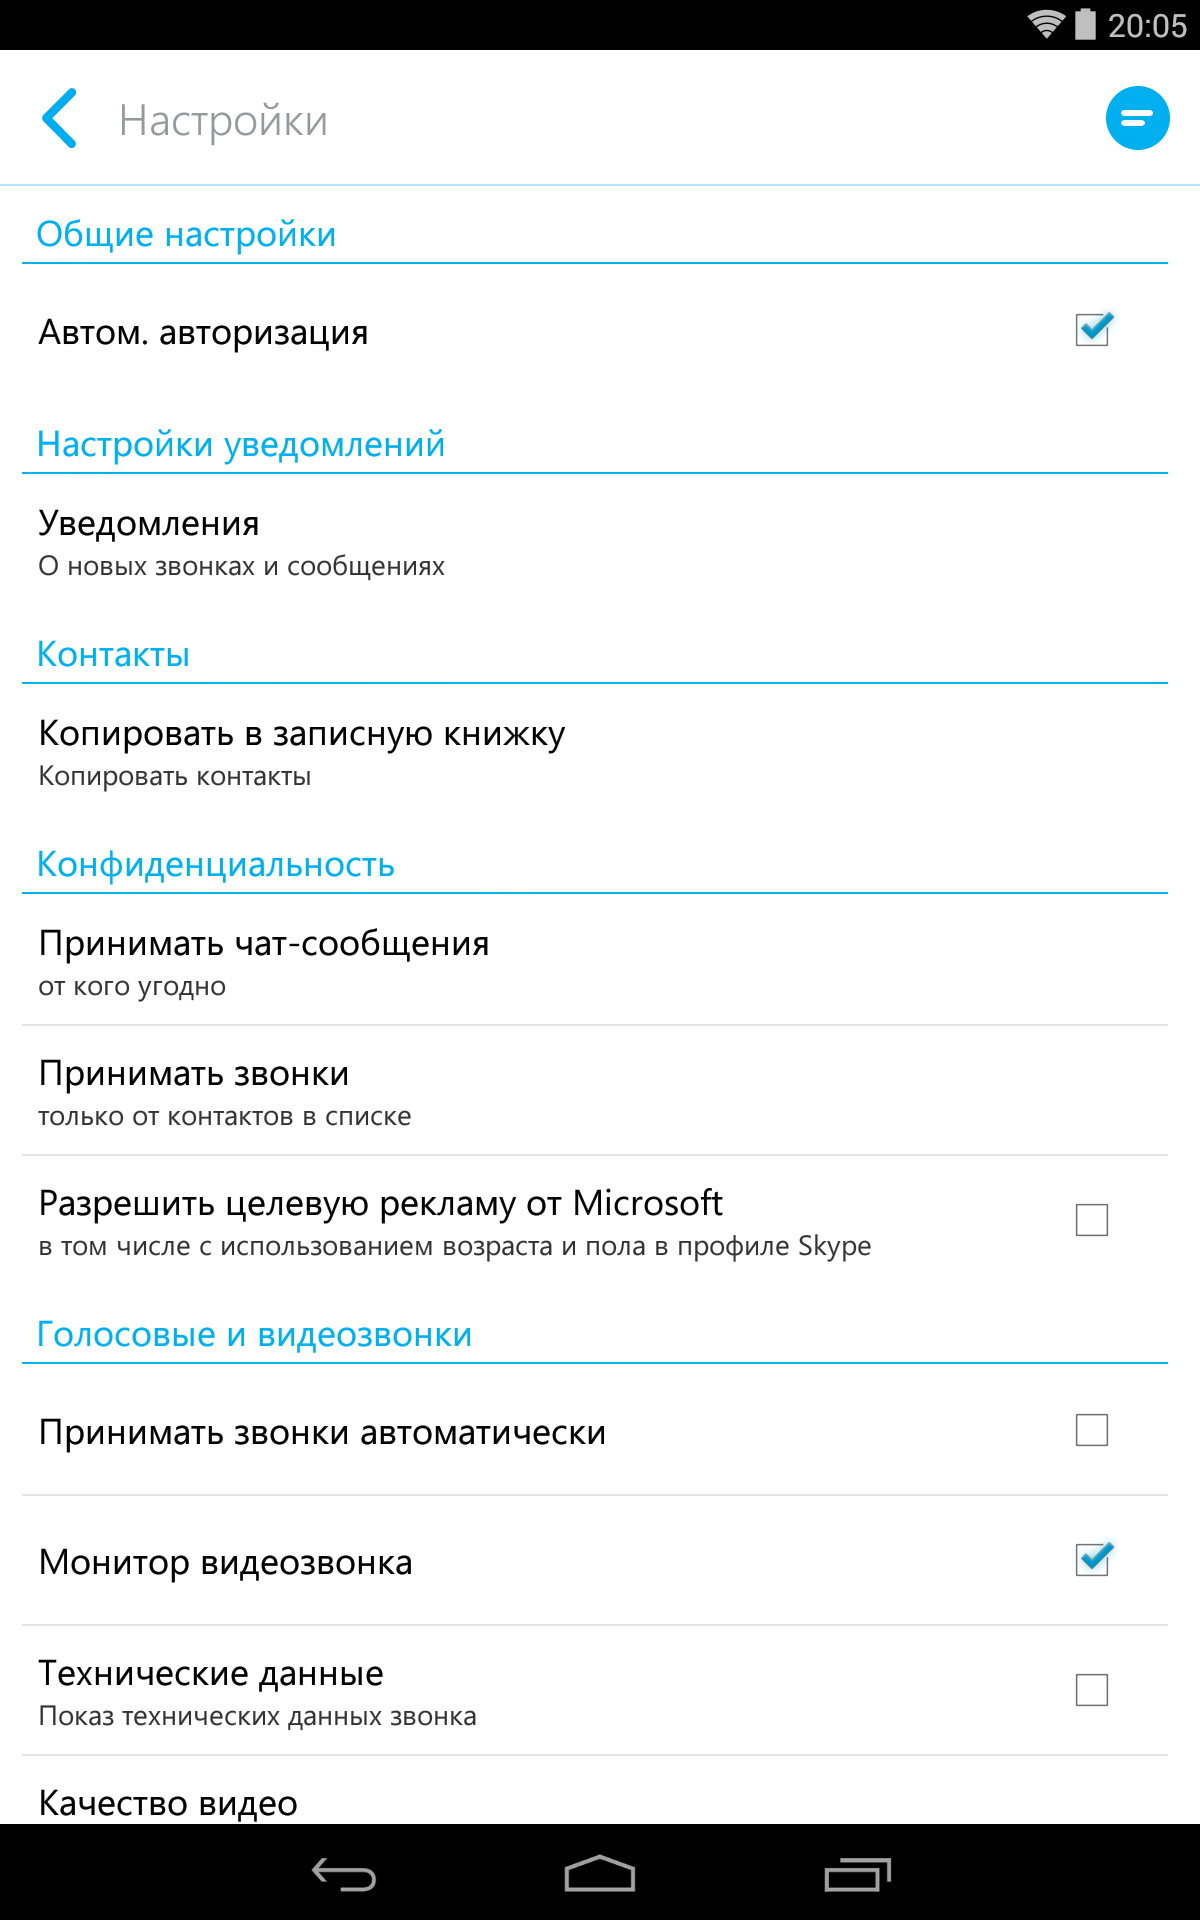 Skype последняя версия.